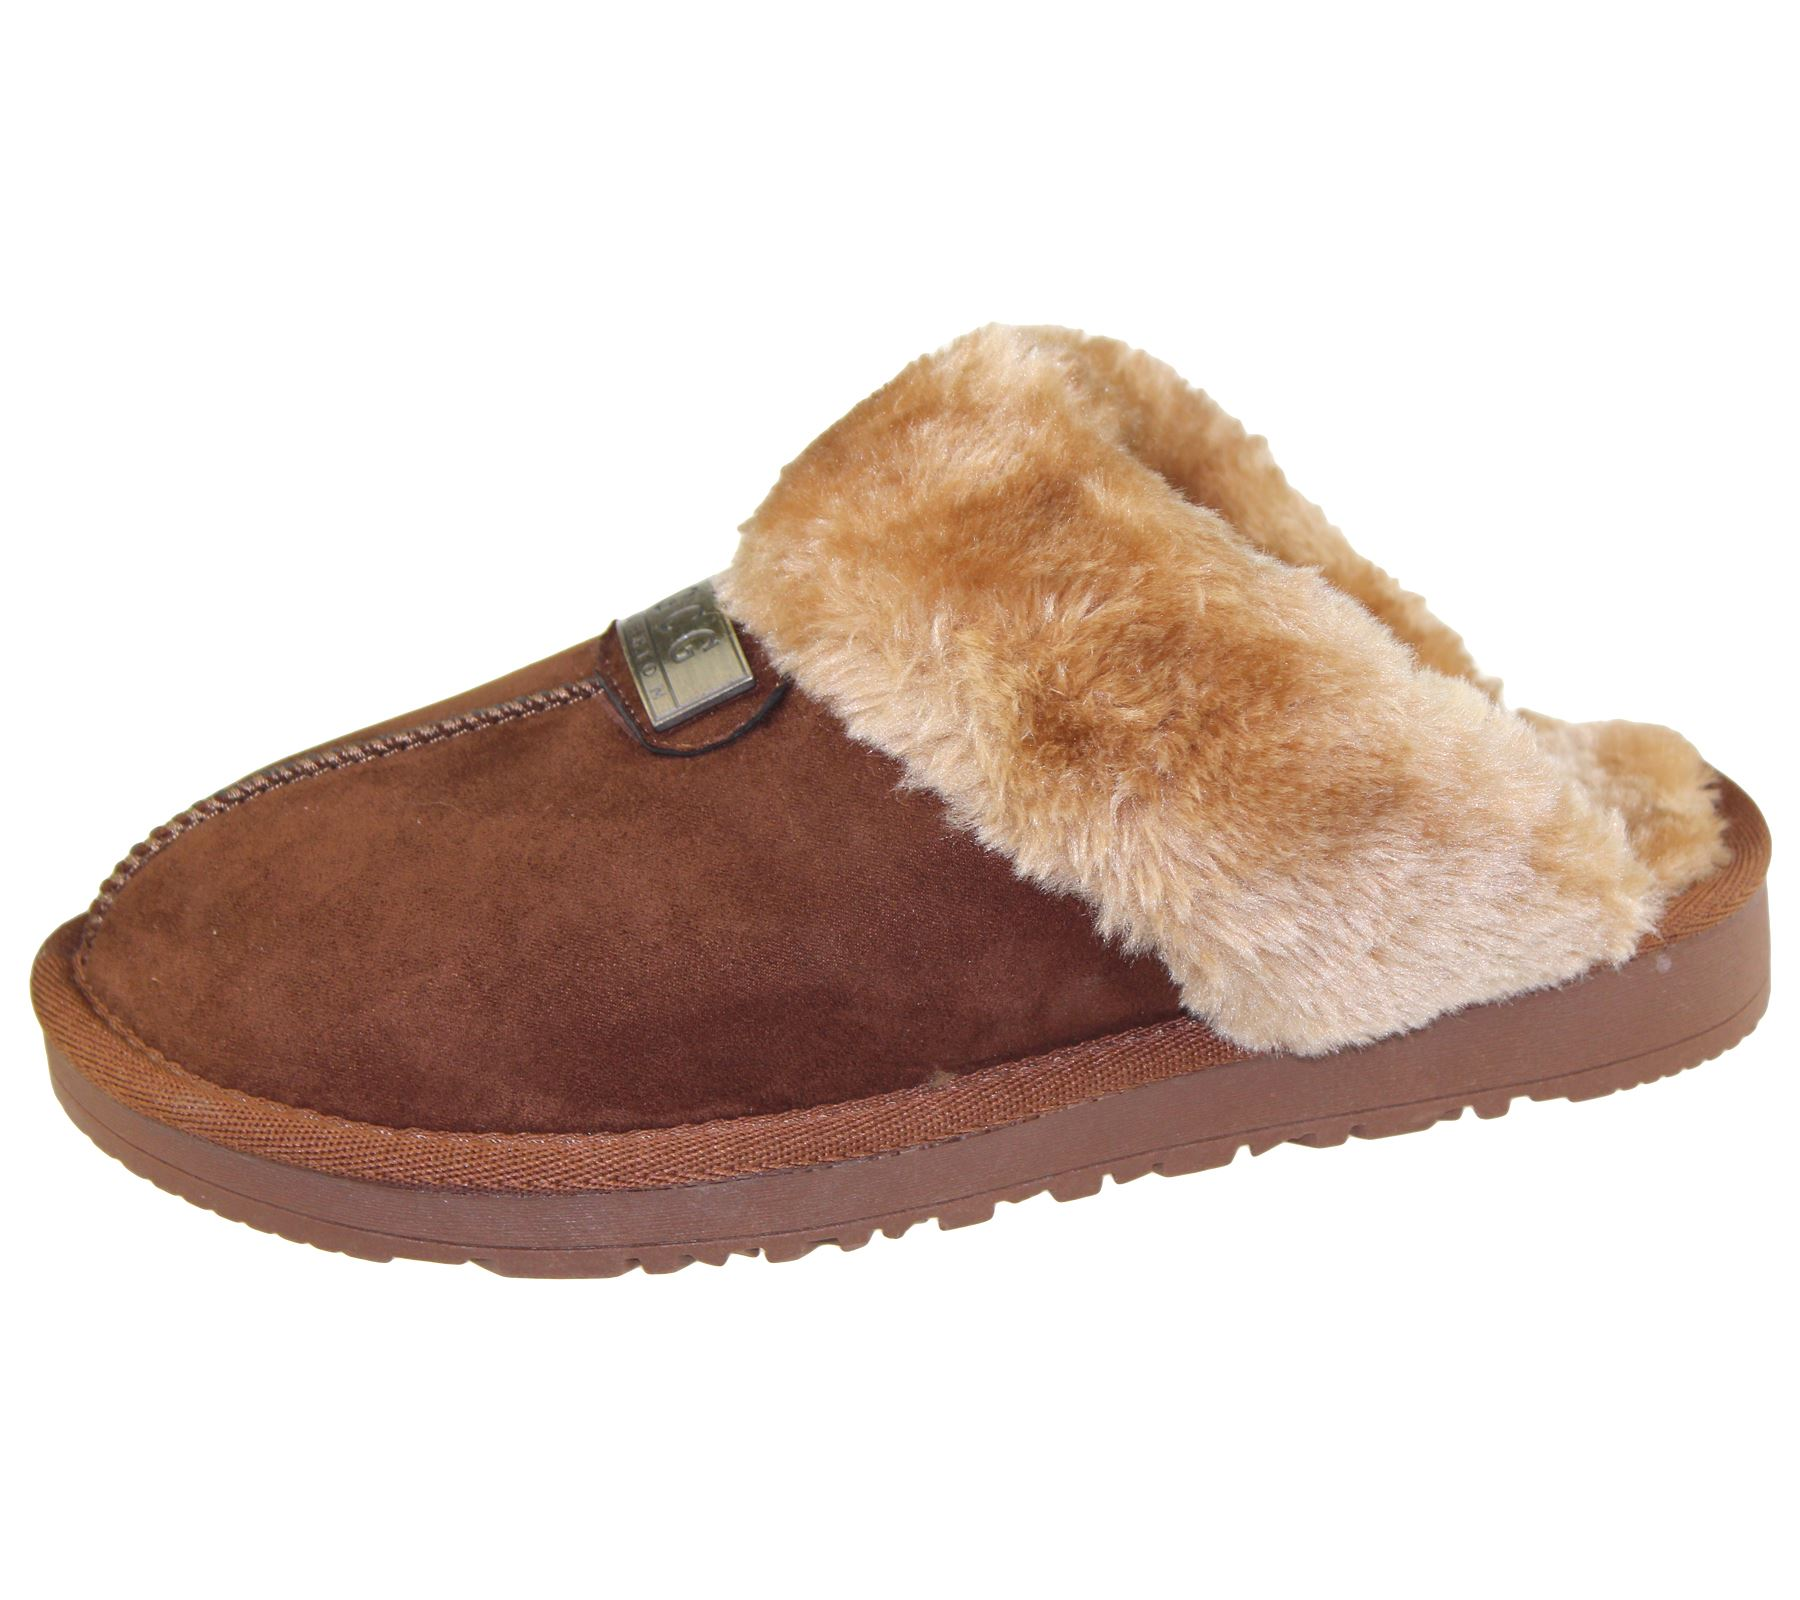 Womens Fur Lined Slippers Ladies Mules